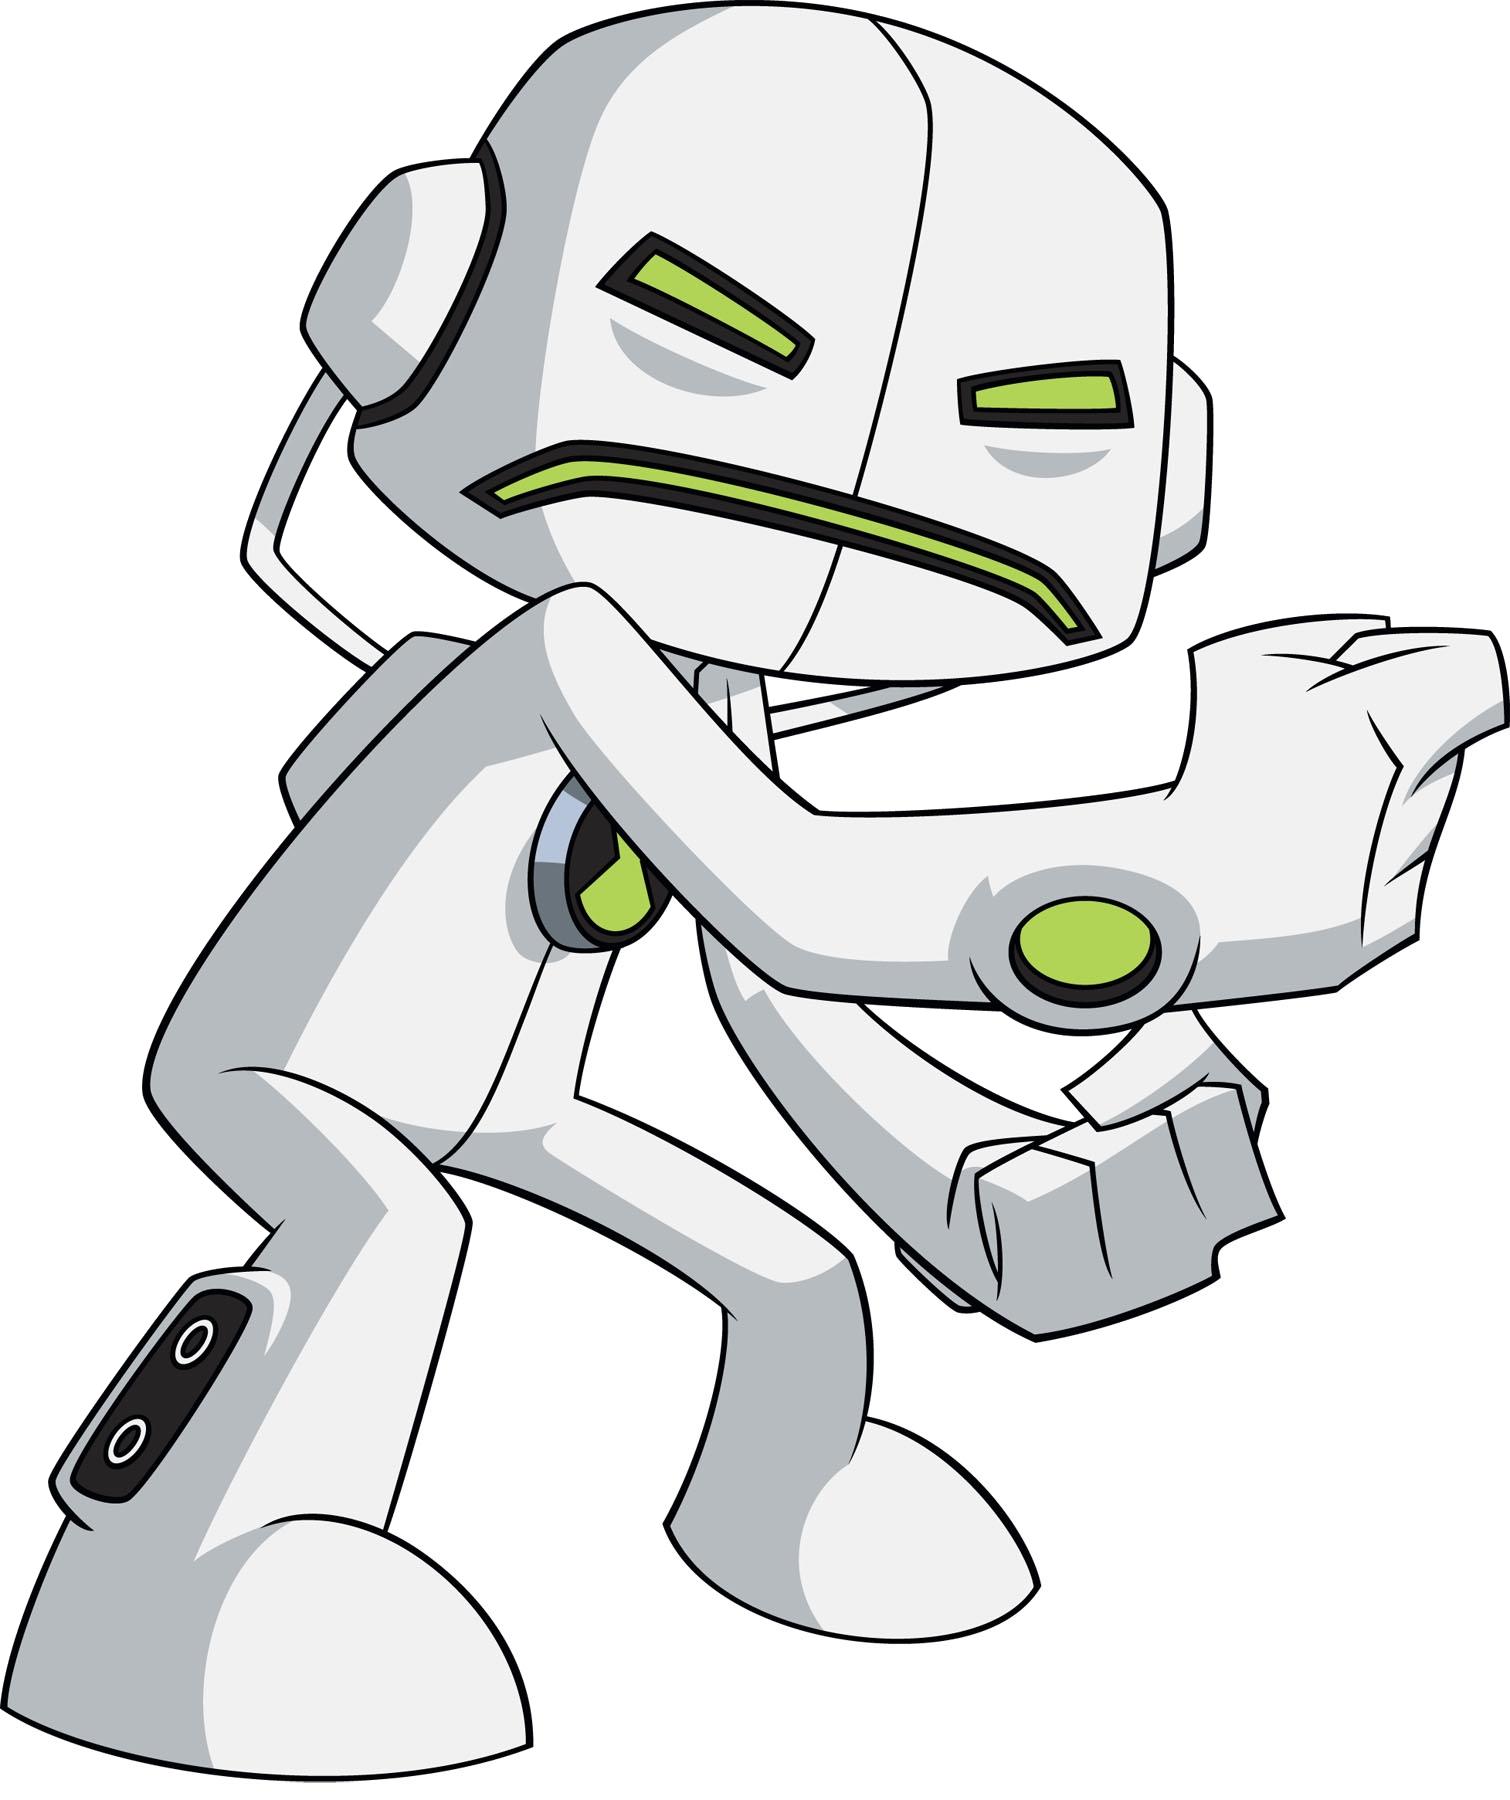 svg free download drawing robots alien #95488586